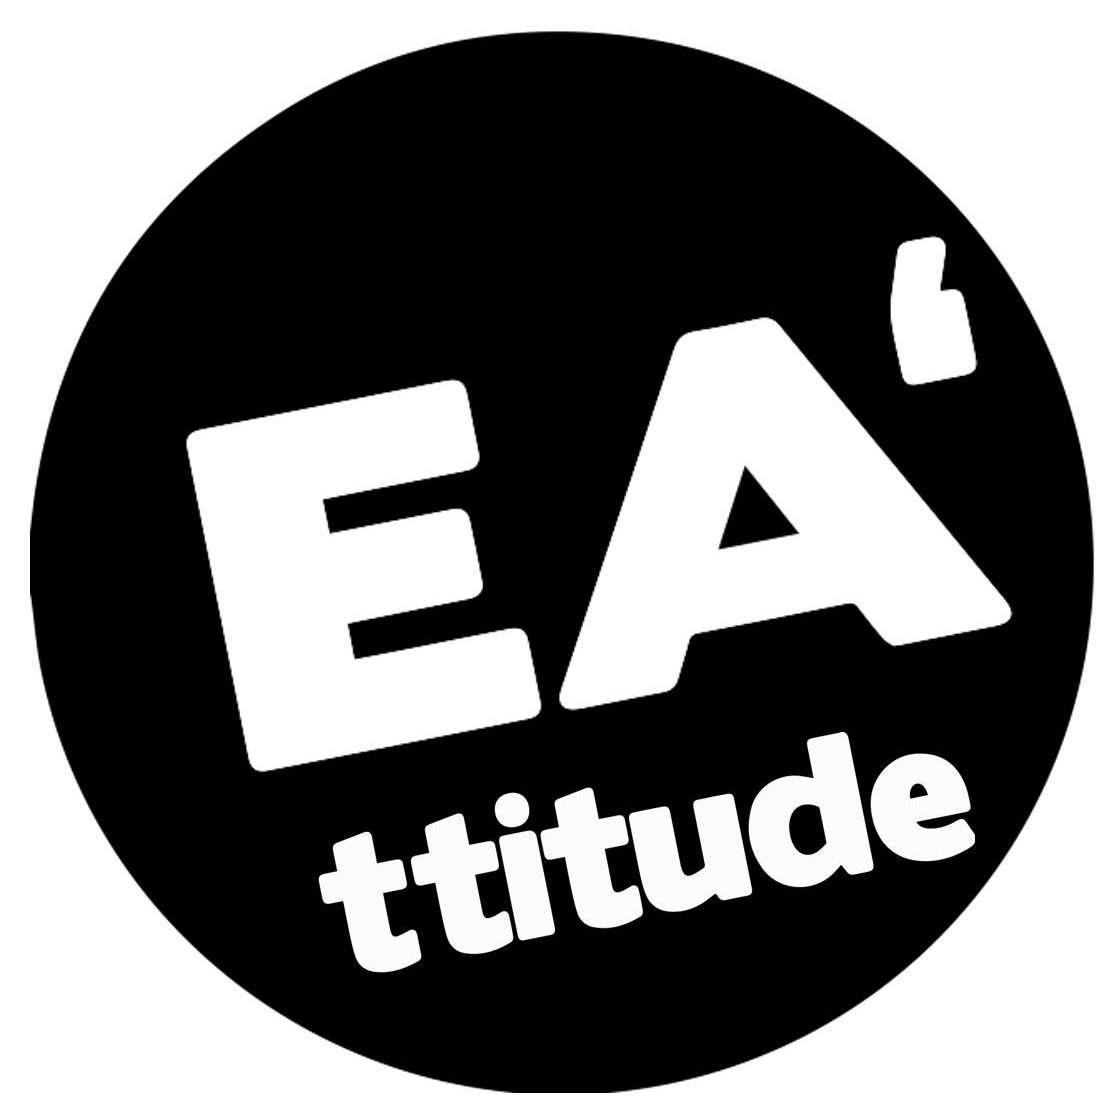 logo-eattitude